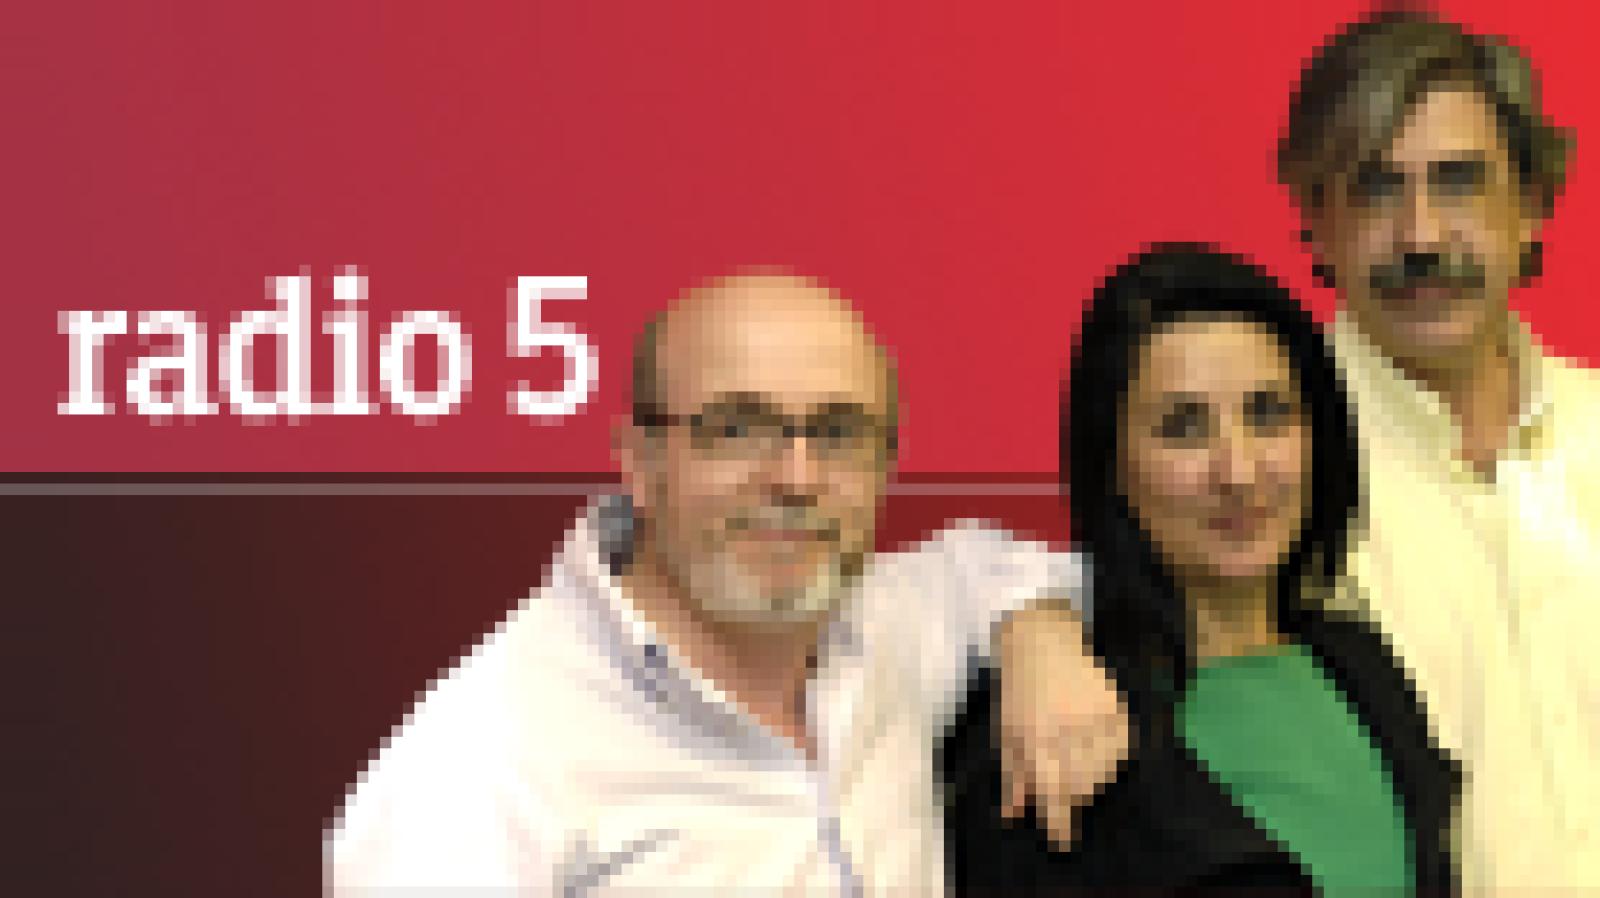 Archivo sonoro - Pepe Rubio - 17/03/12 - Escuchar ahora